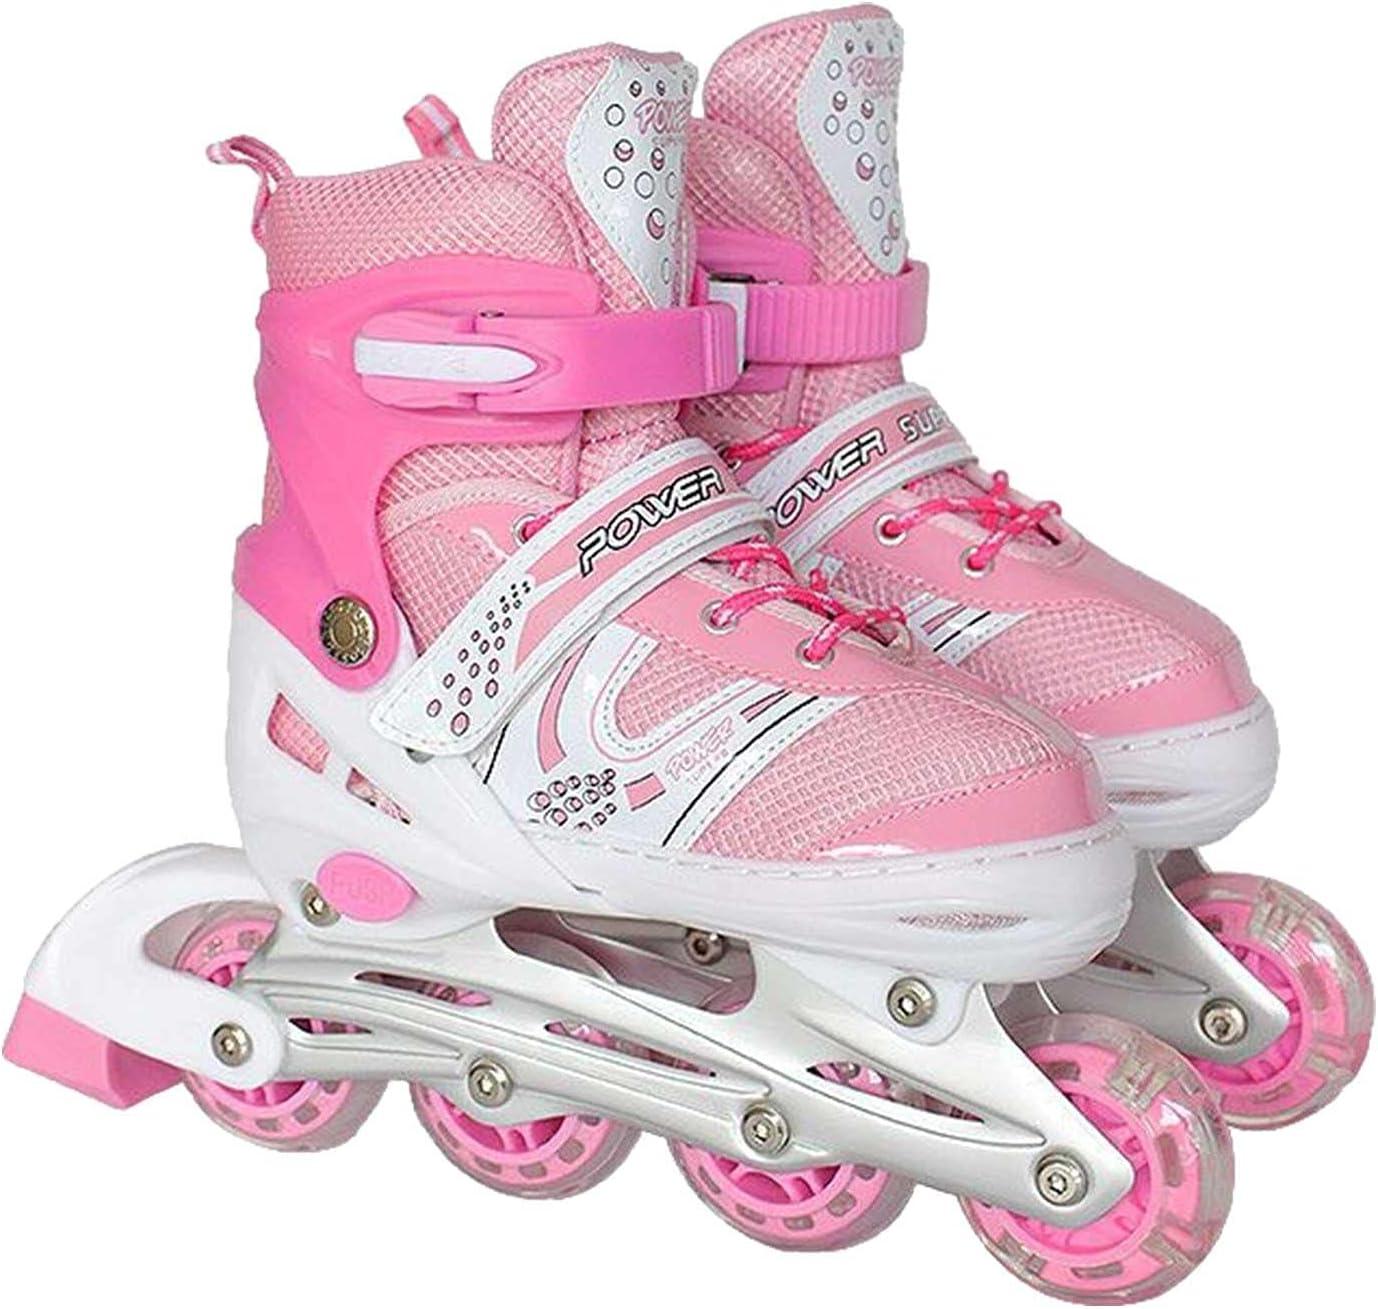 SMASAMDE Kids Inline Flashing New Shipping Free Skates Roller New product! New type